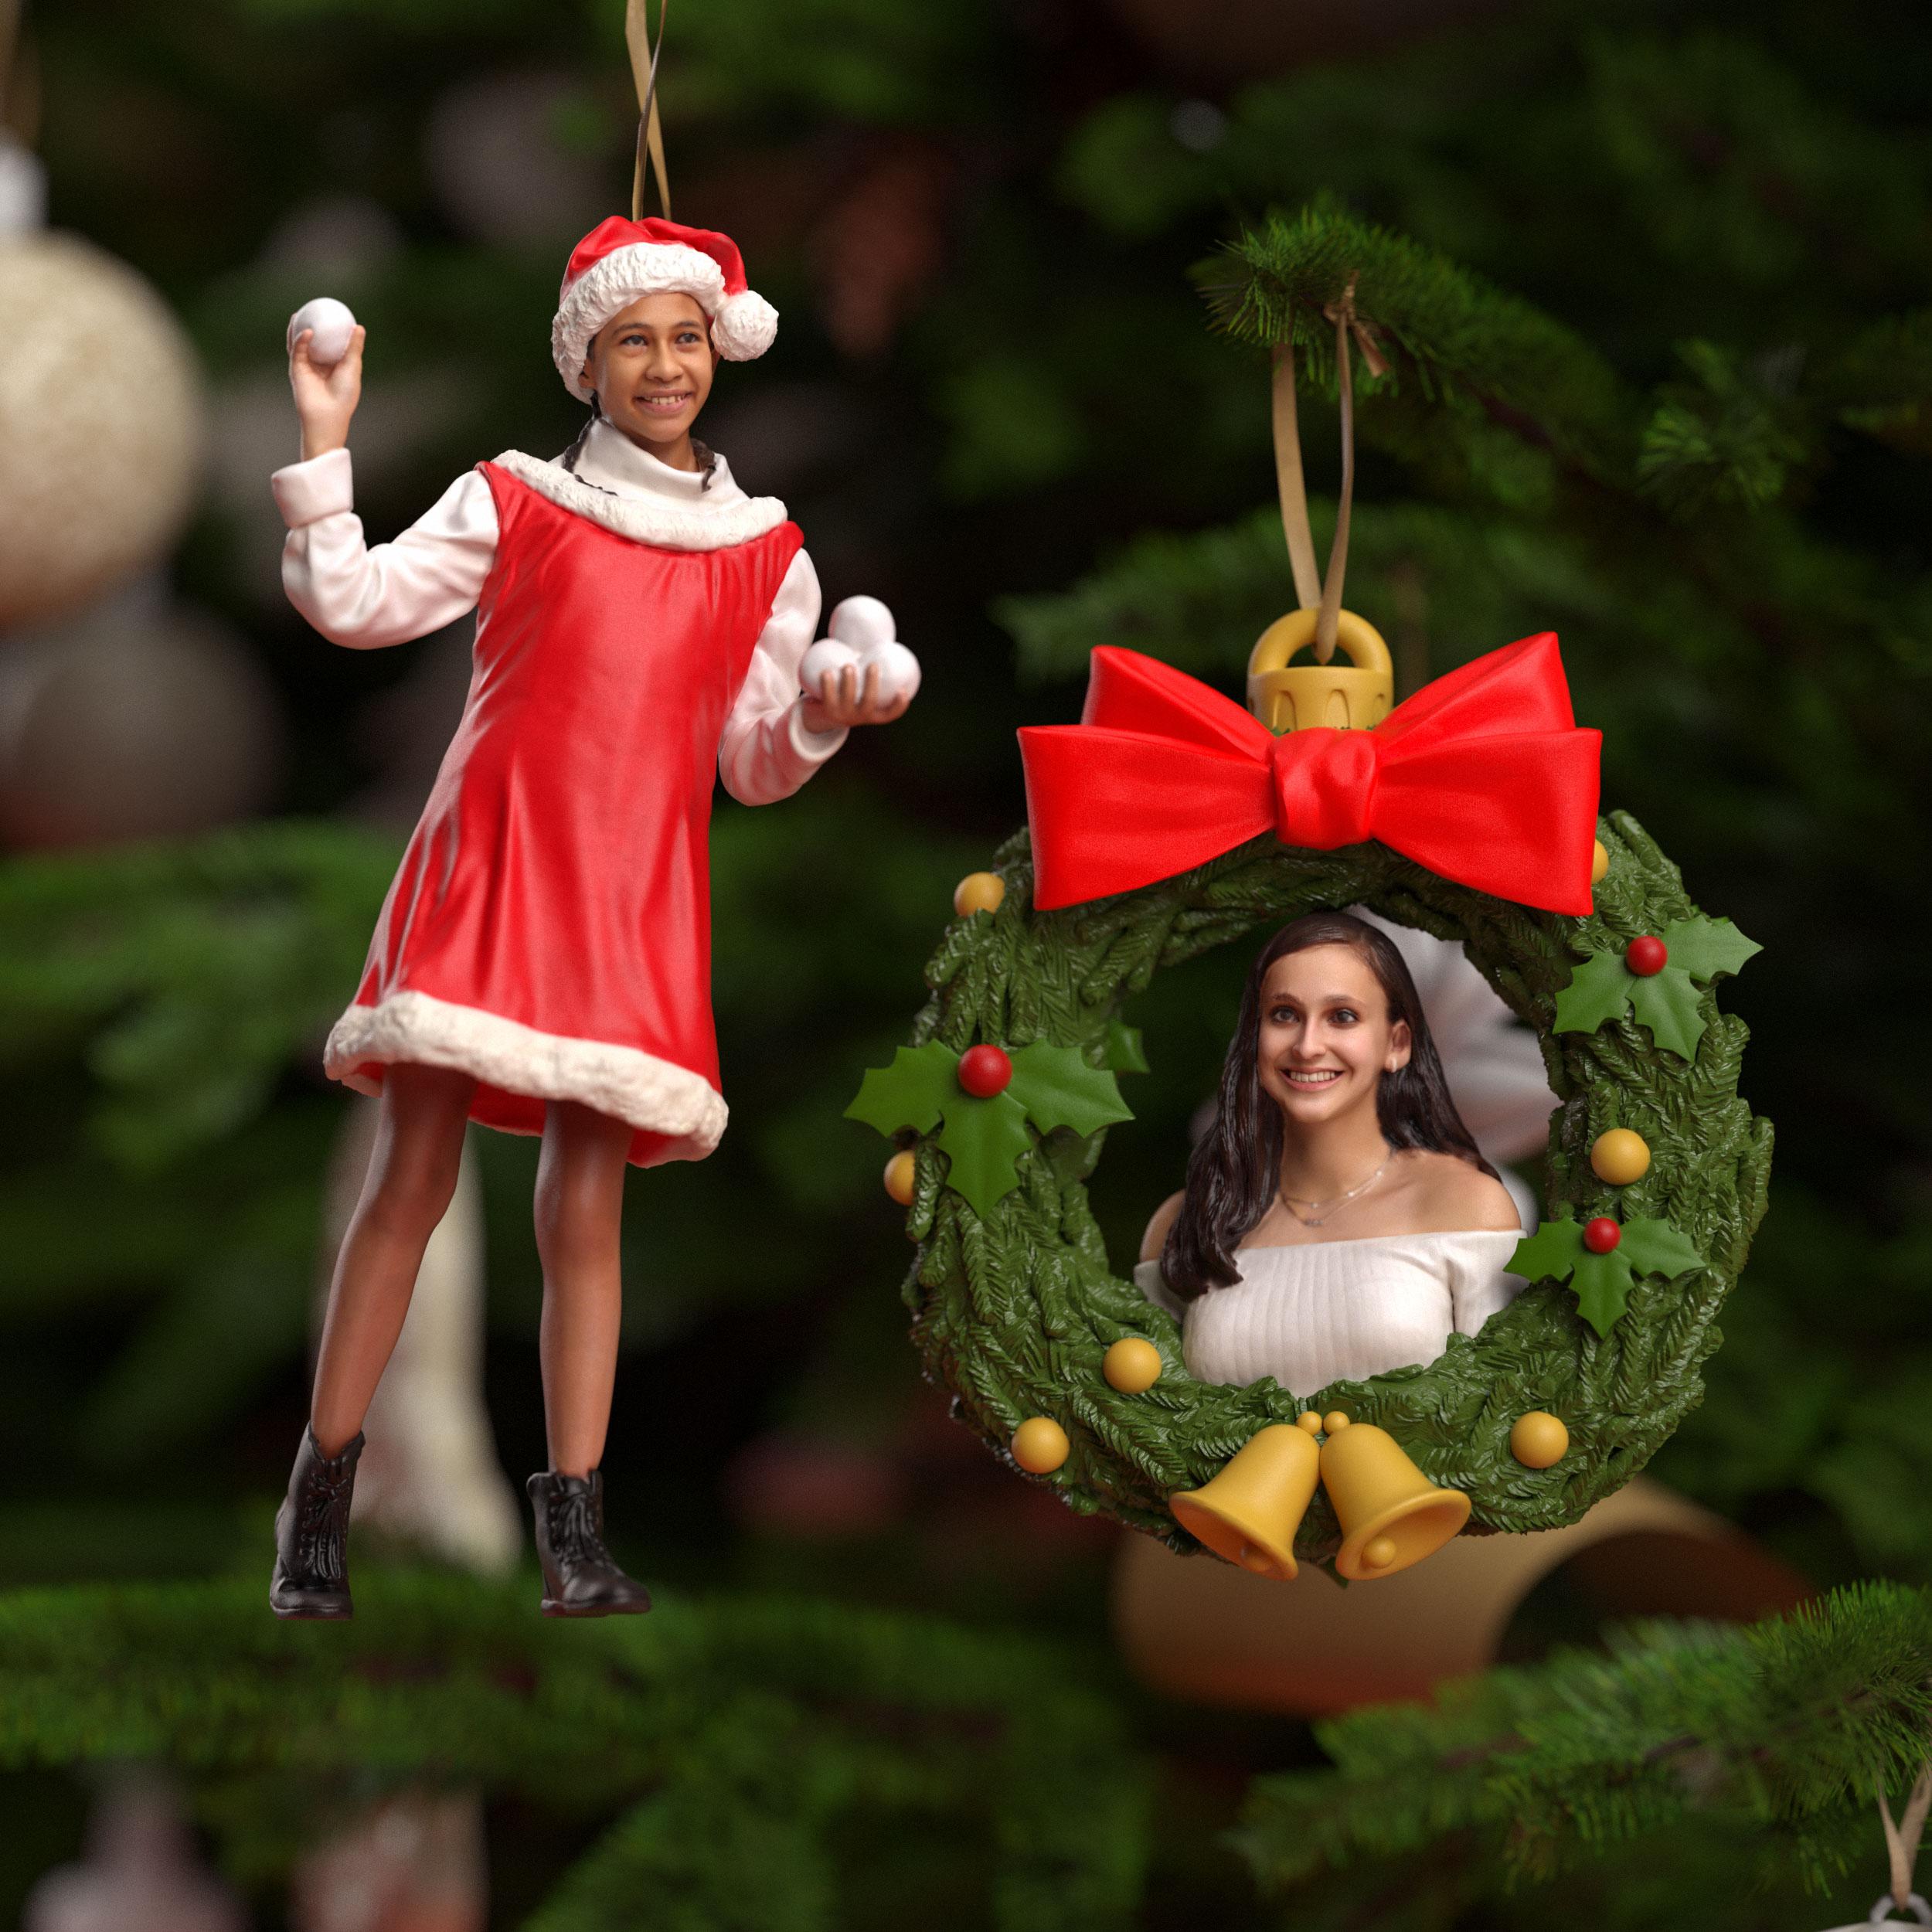 Dopl ornaments